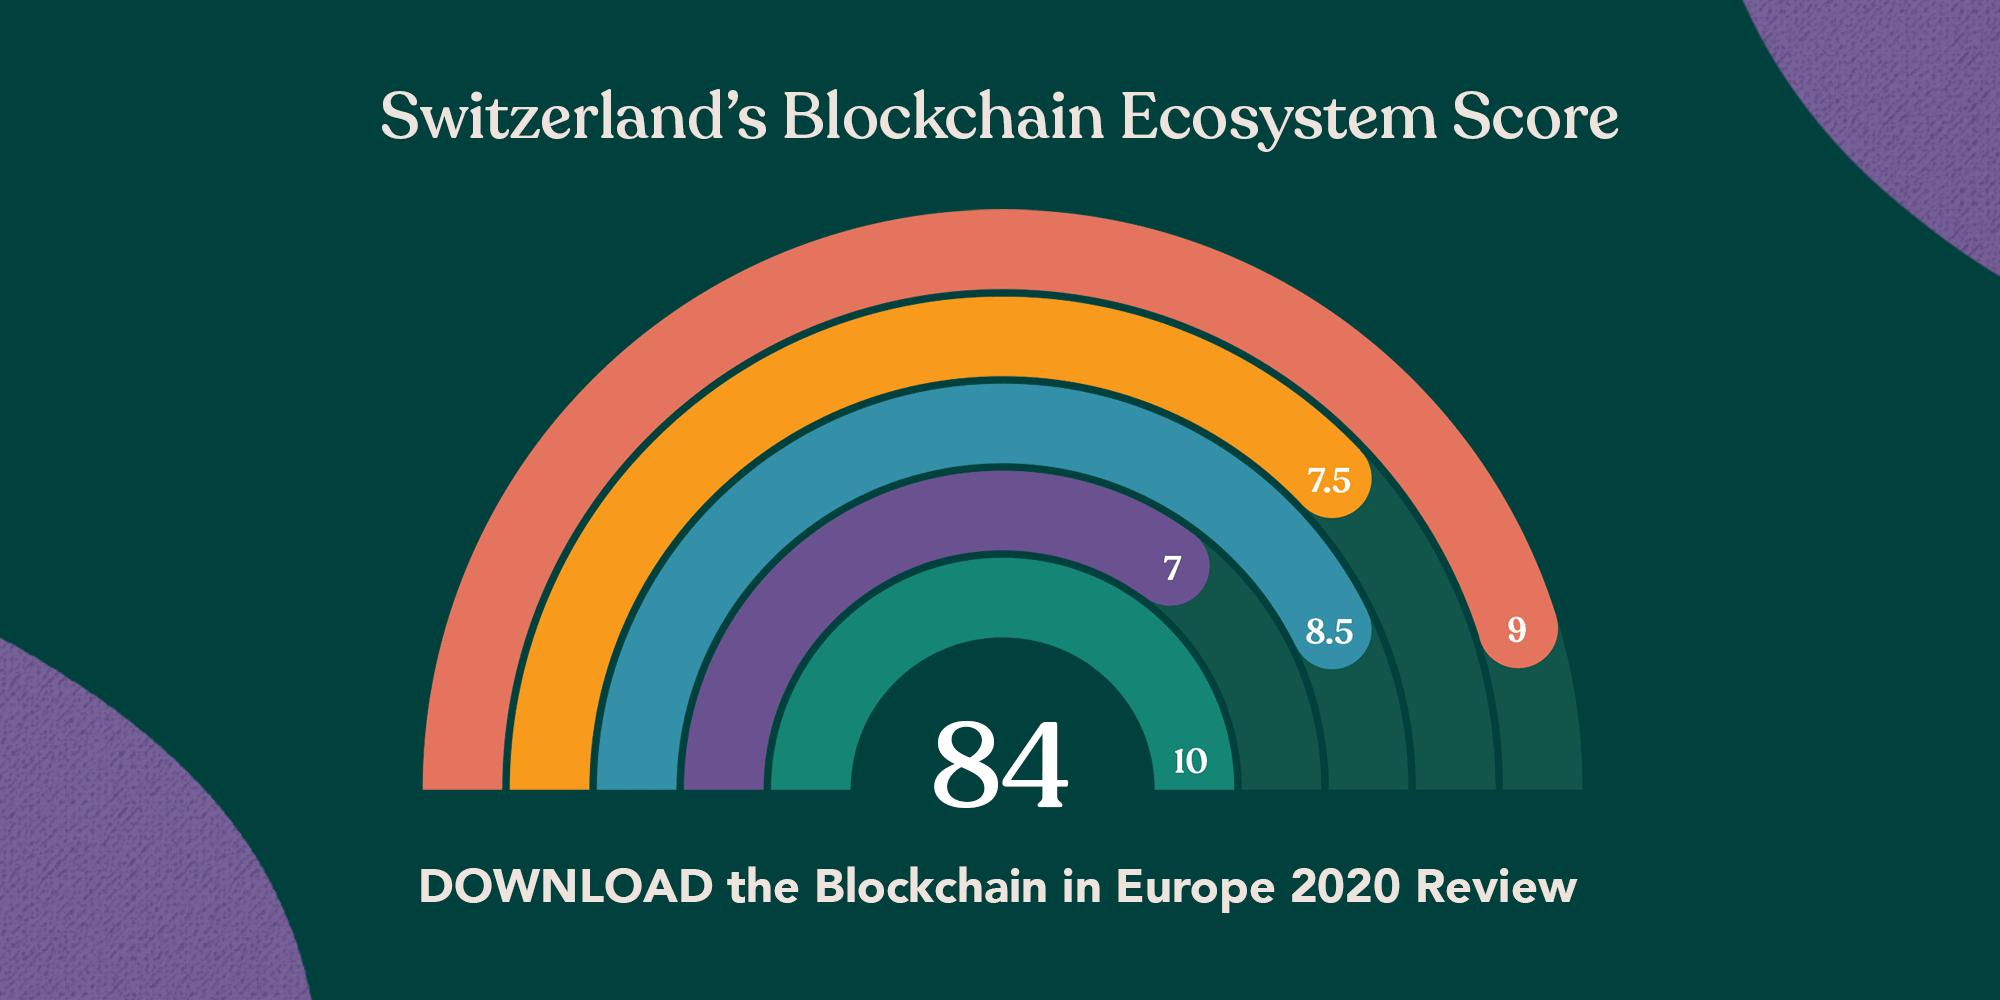 Switzerland's Blockchain Ecosystem Score: A rainbow, each arc representing a different score. 9, 7.5, 8.5, 7, 10, for 84.